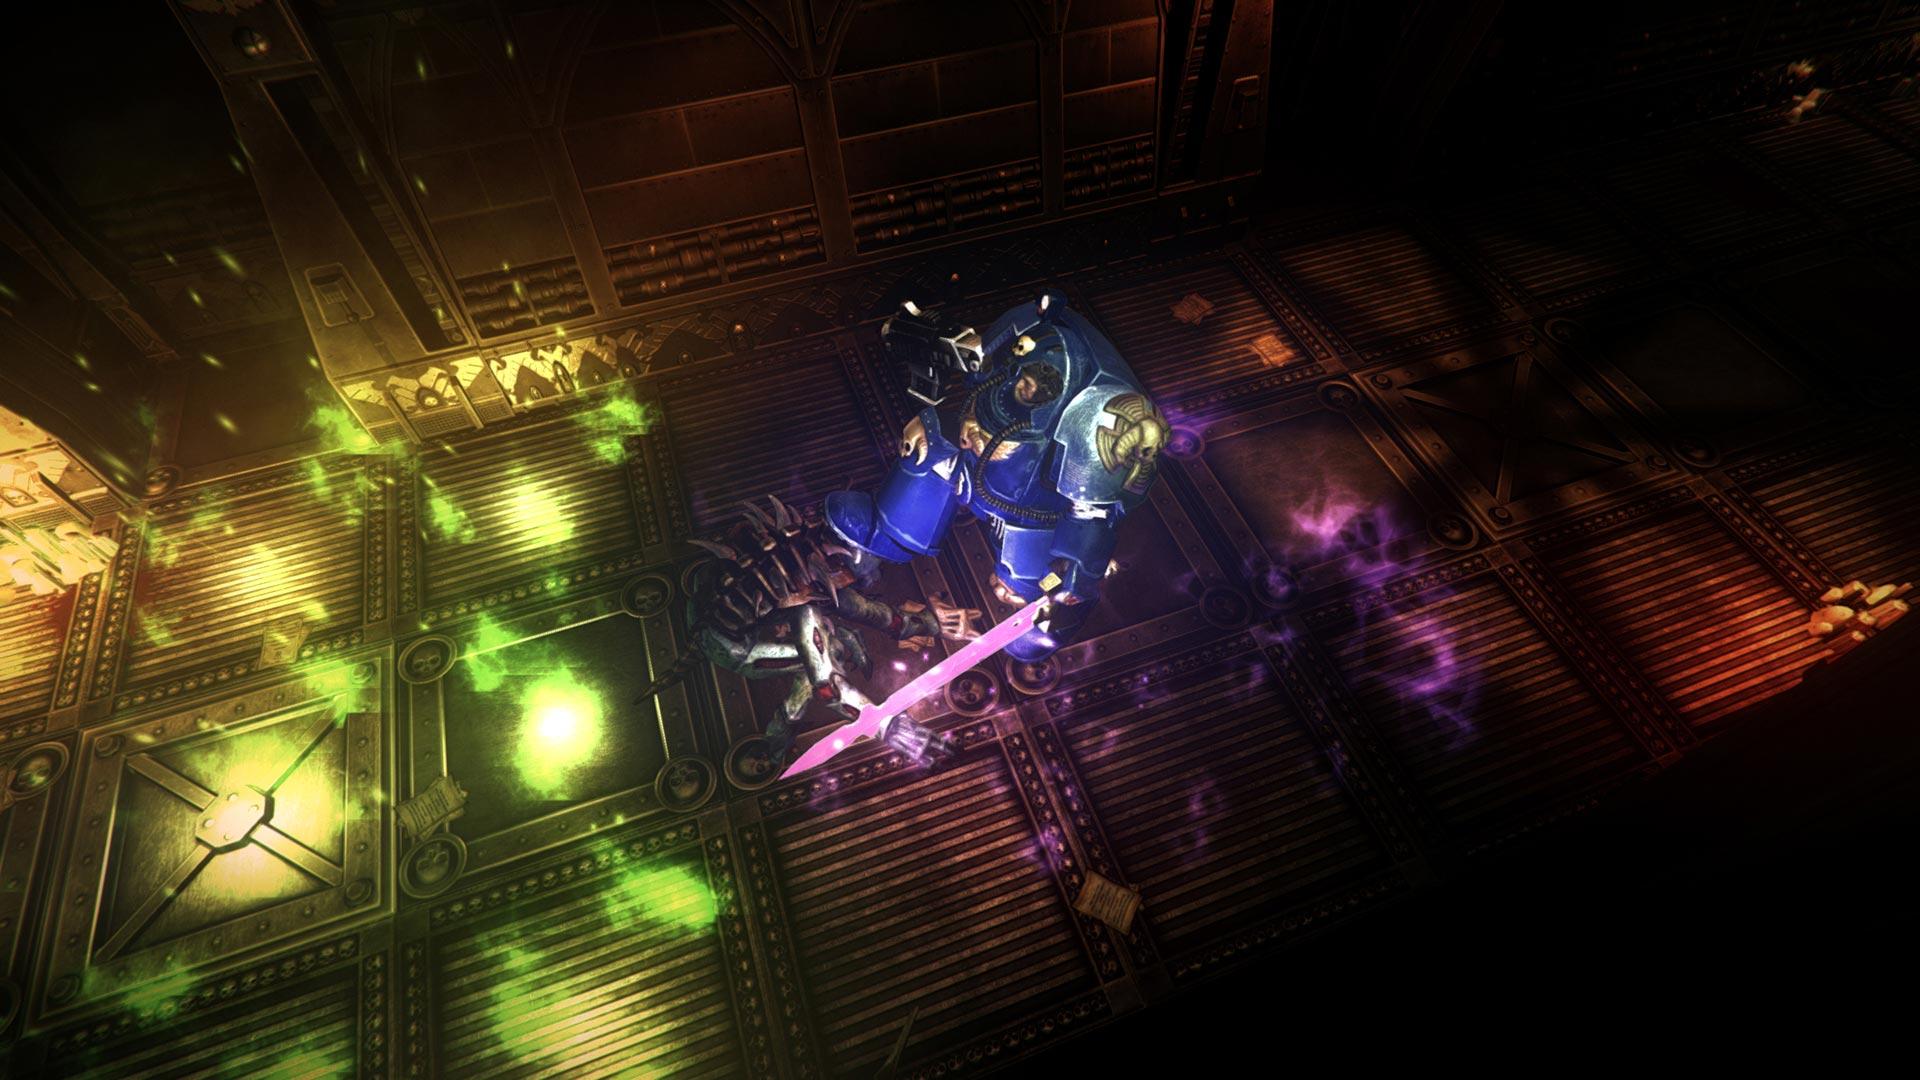 space-hulk-ascension-review-screenshot-1